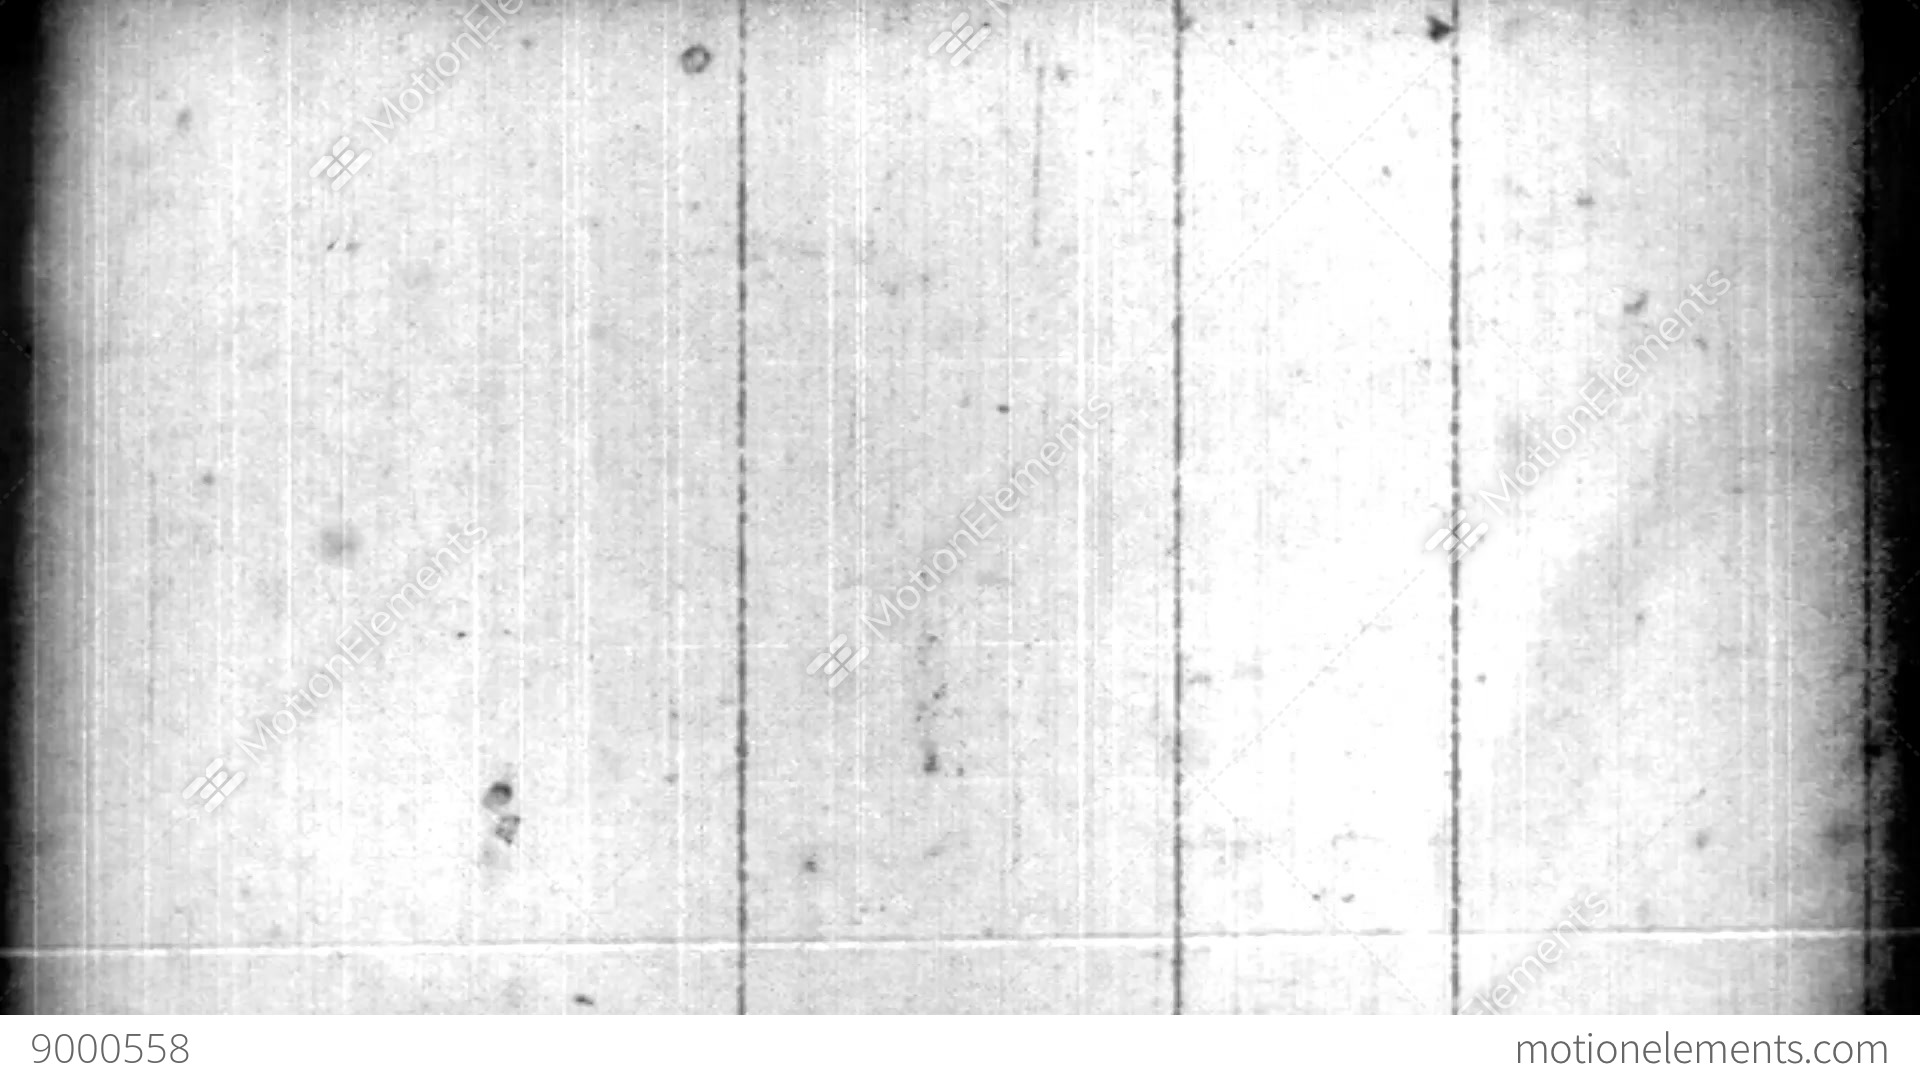 Black Wood Grain Wallpaper Old Film Look Paper Texture Stock Video Footage 9000558